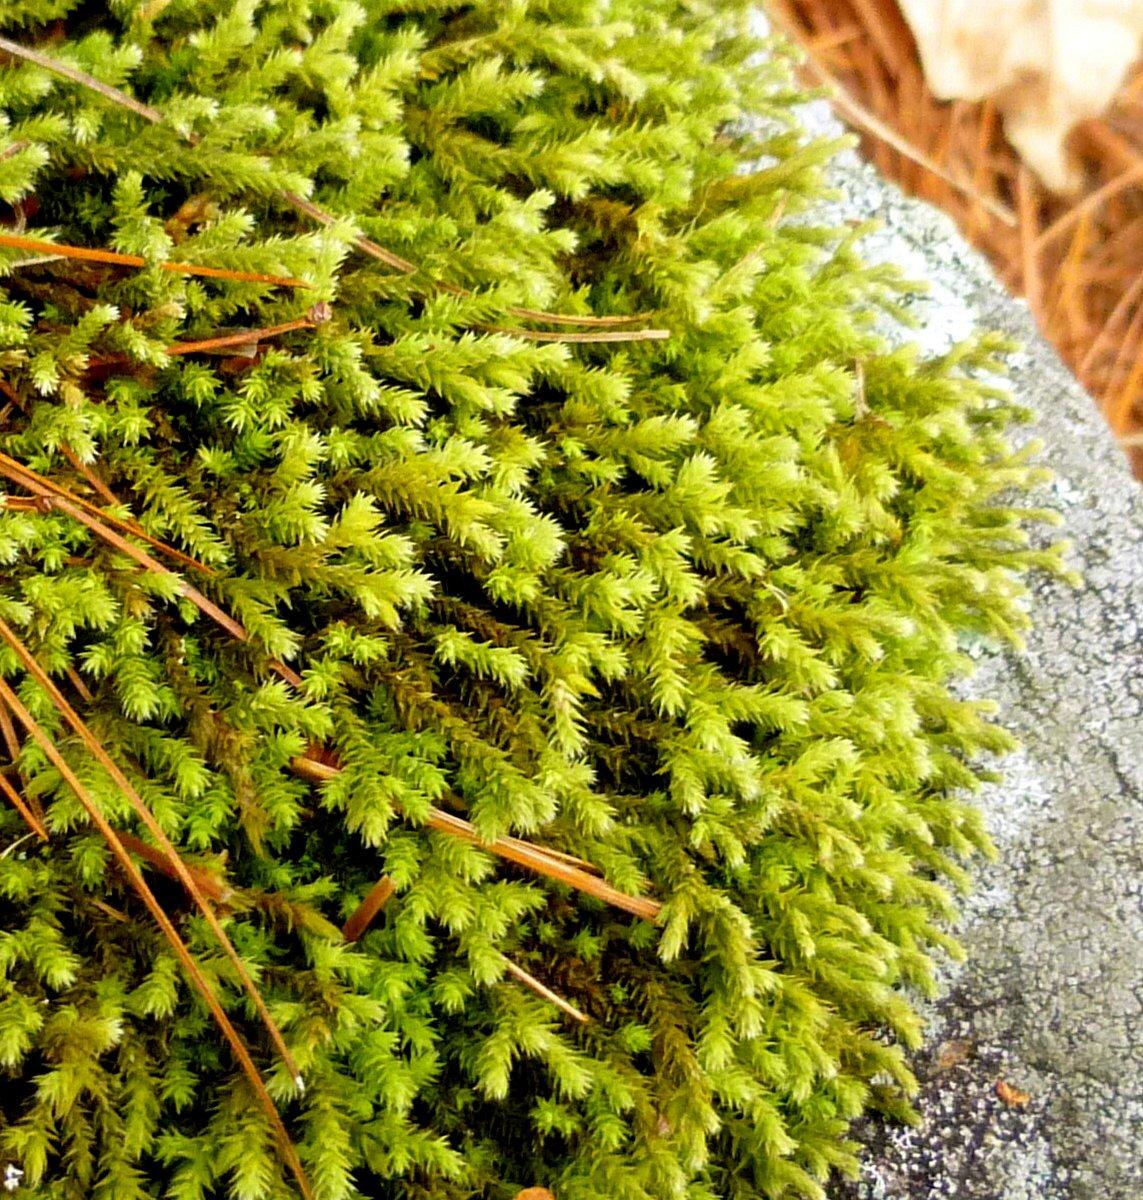 10. Hedwigia cillata Moss